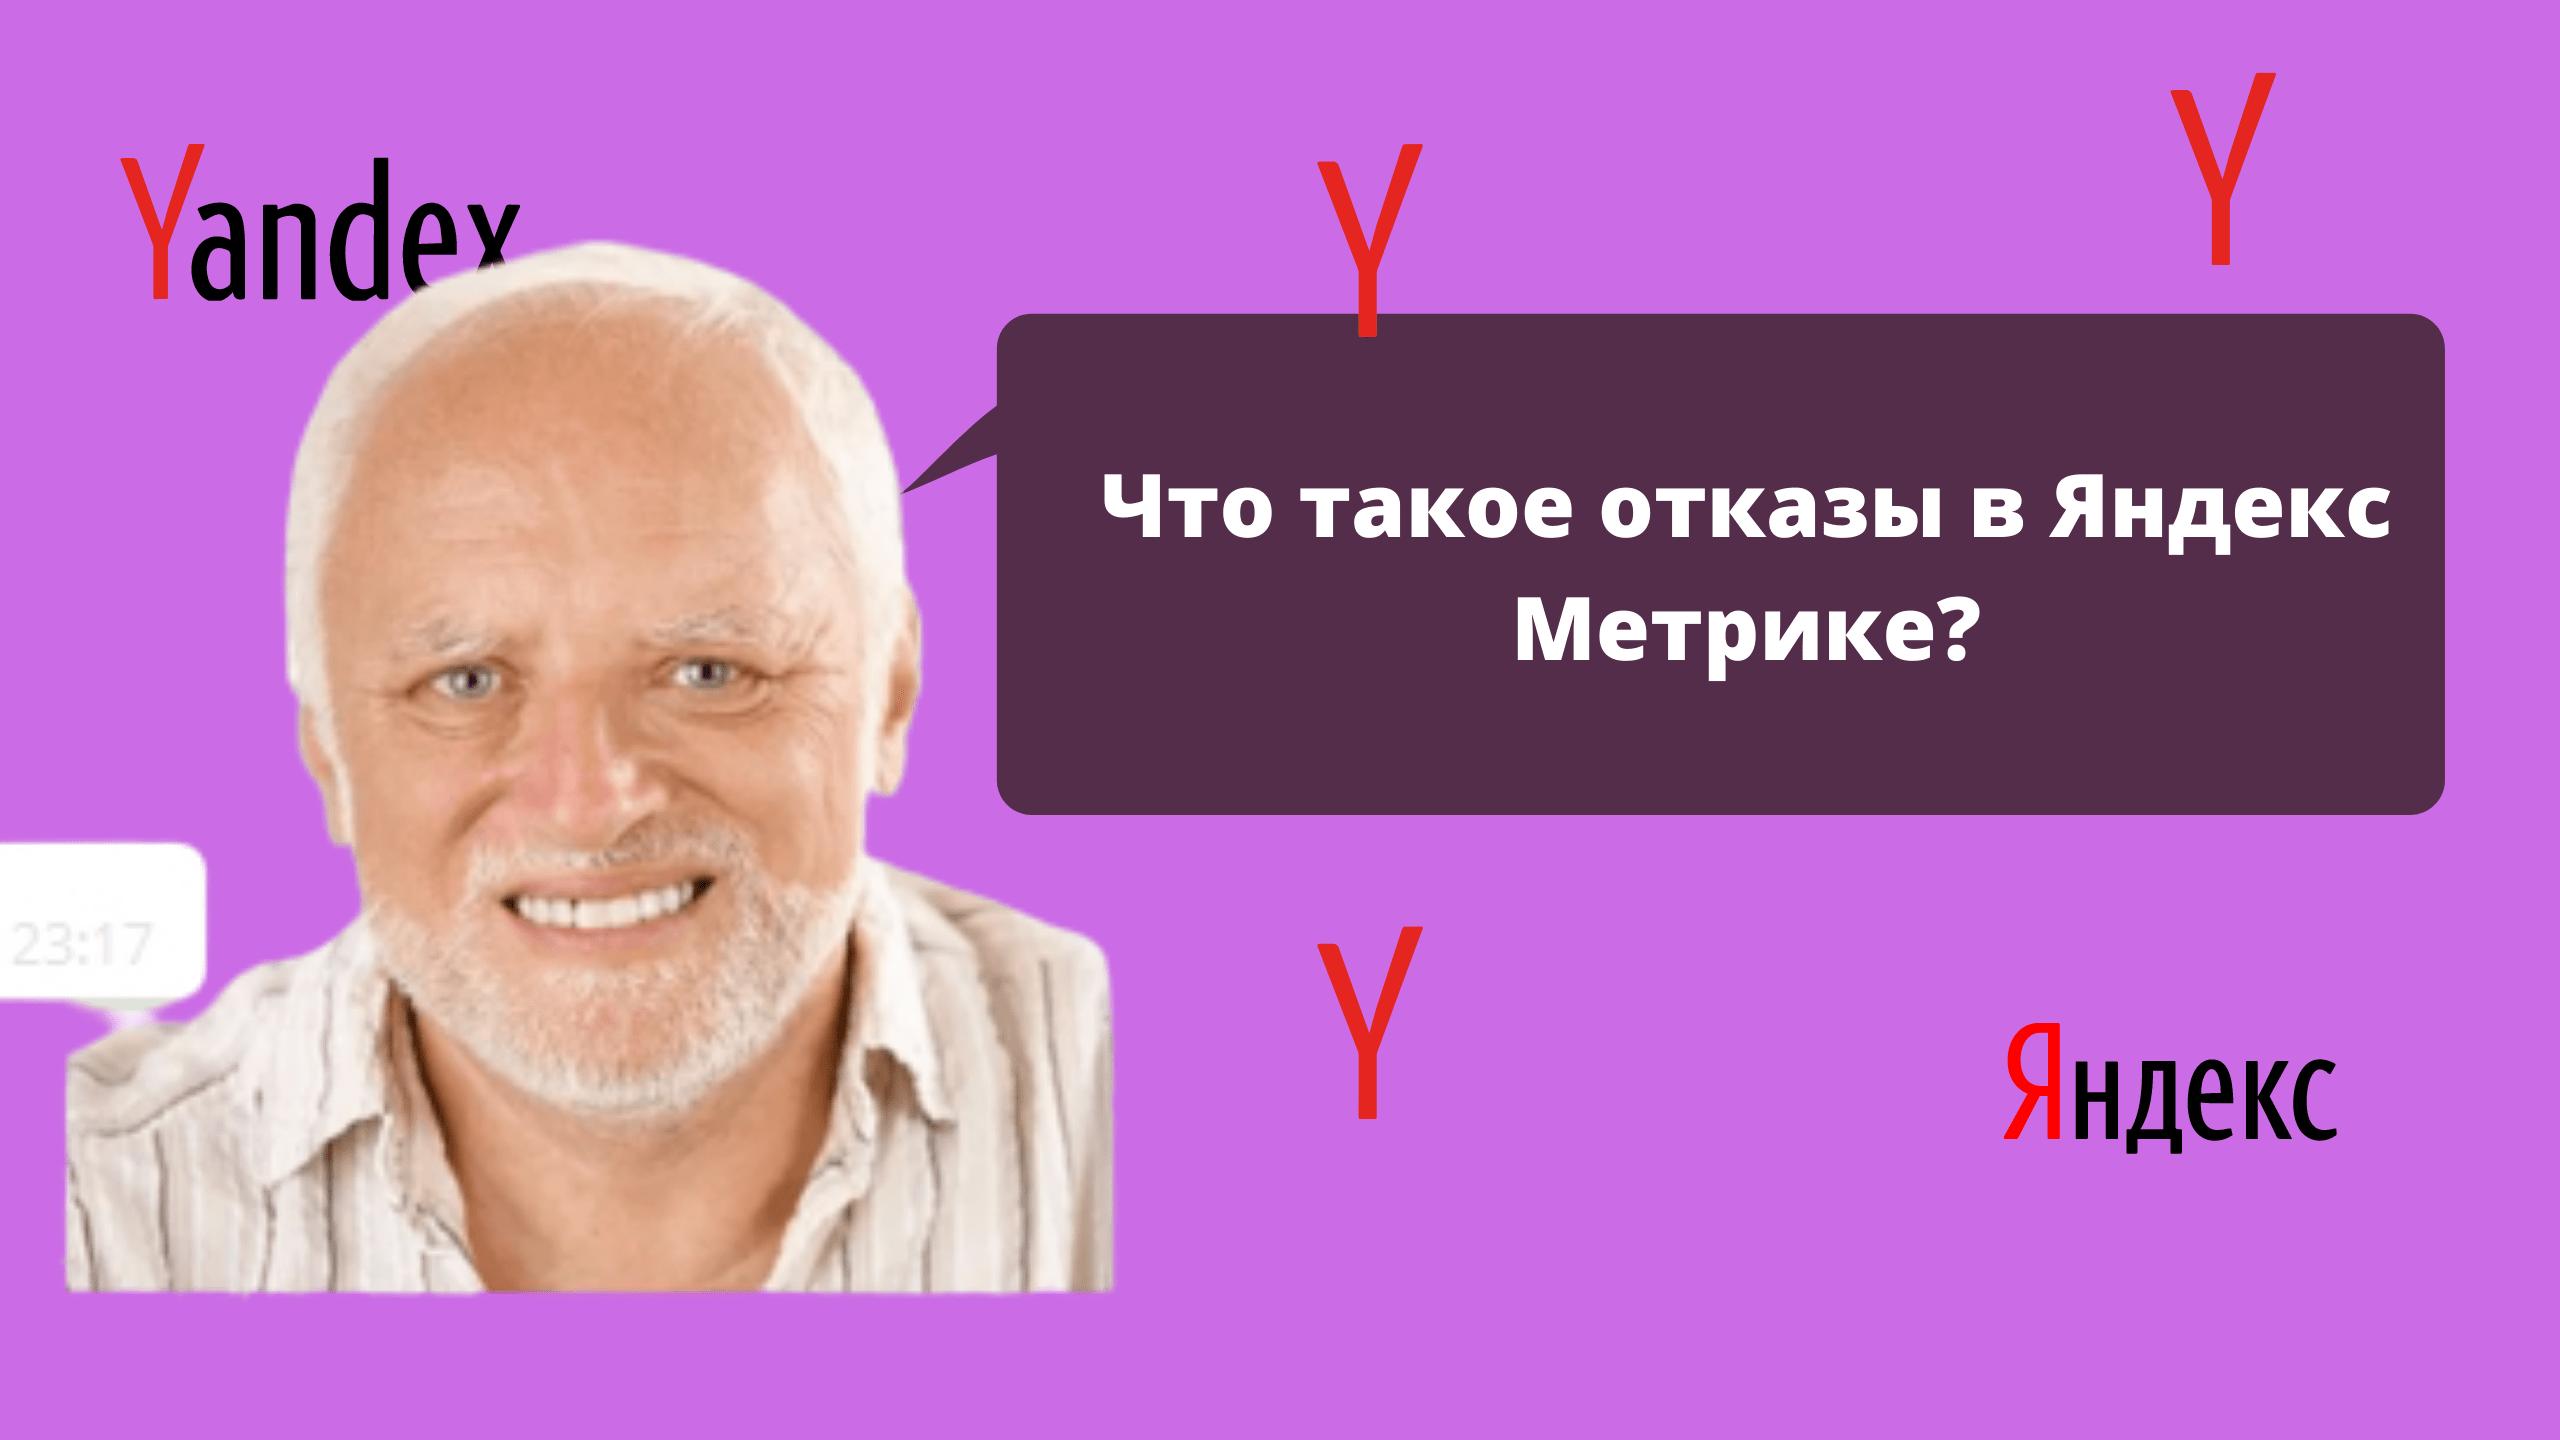 otkazy v metrike - Что такое отказы в Яндекс Метрике?